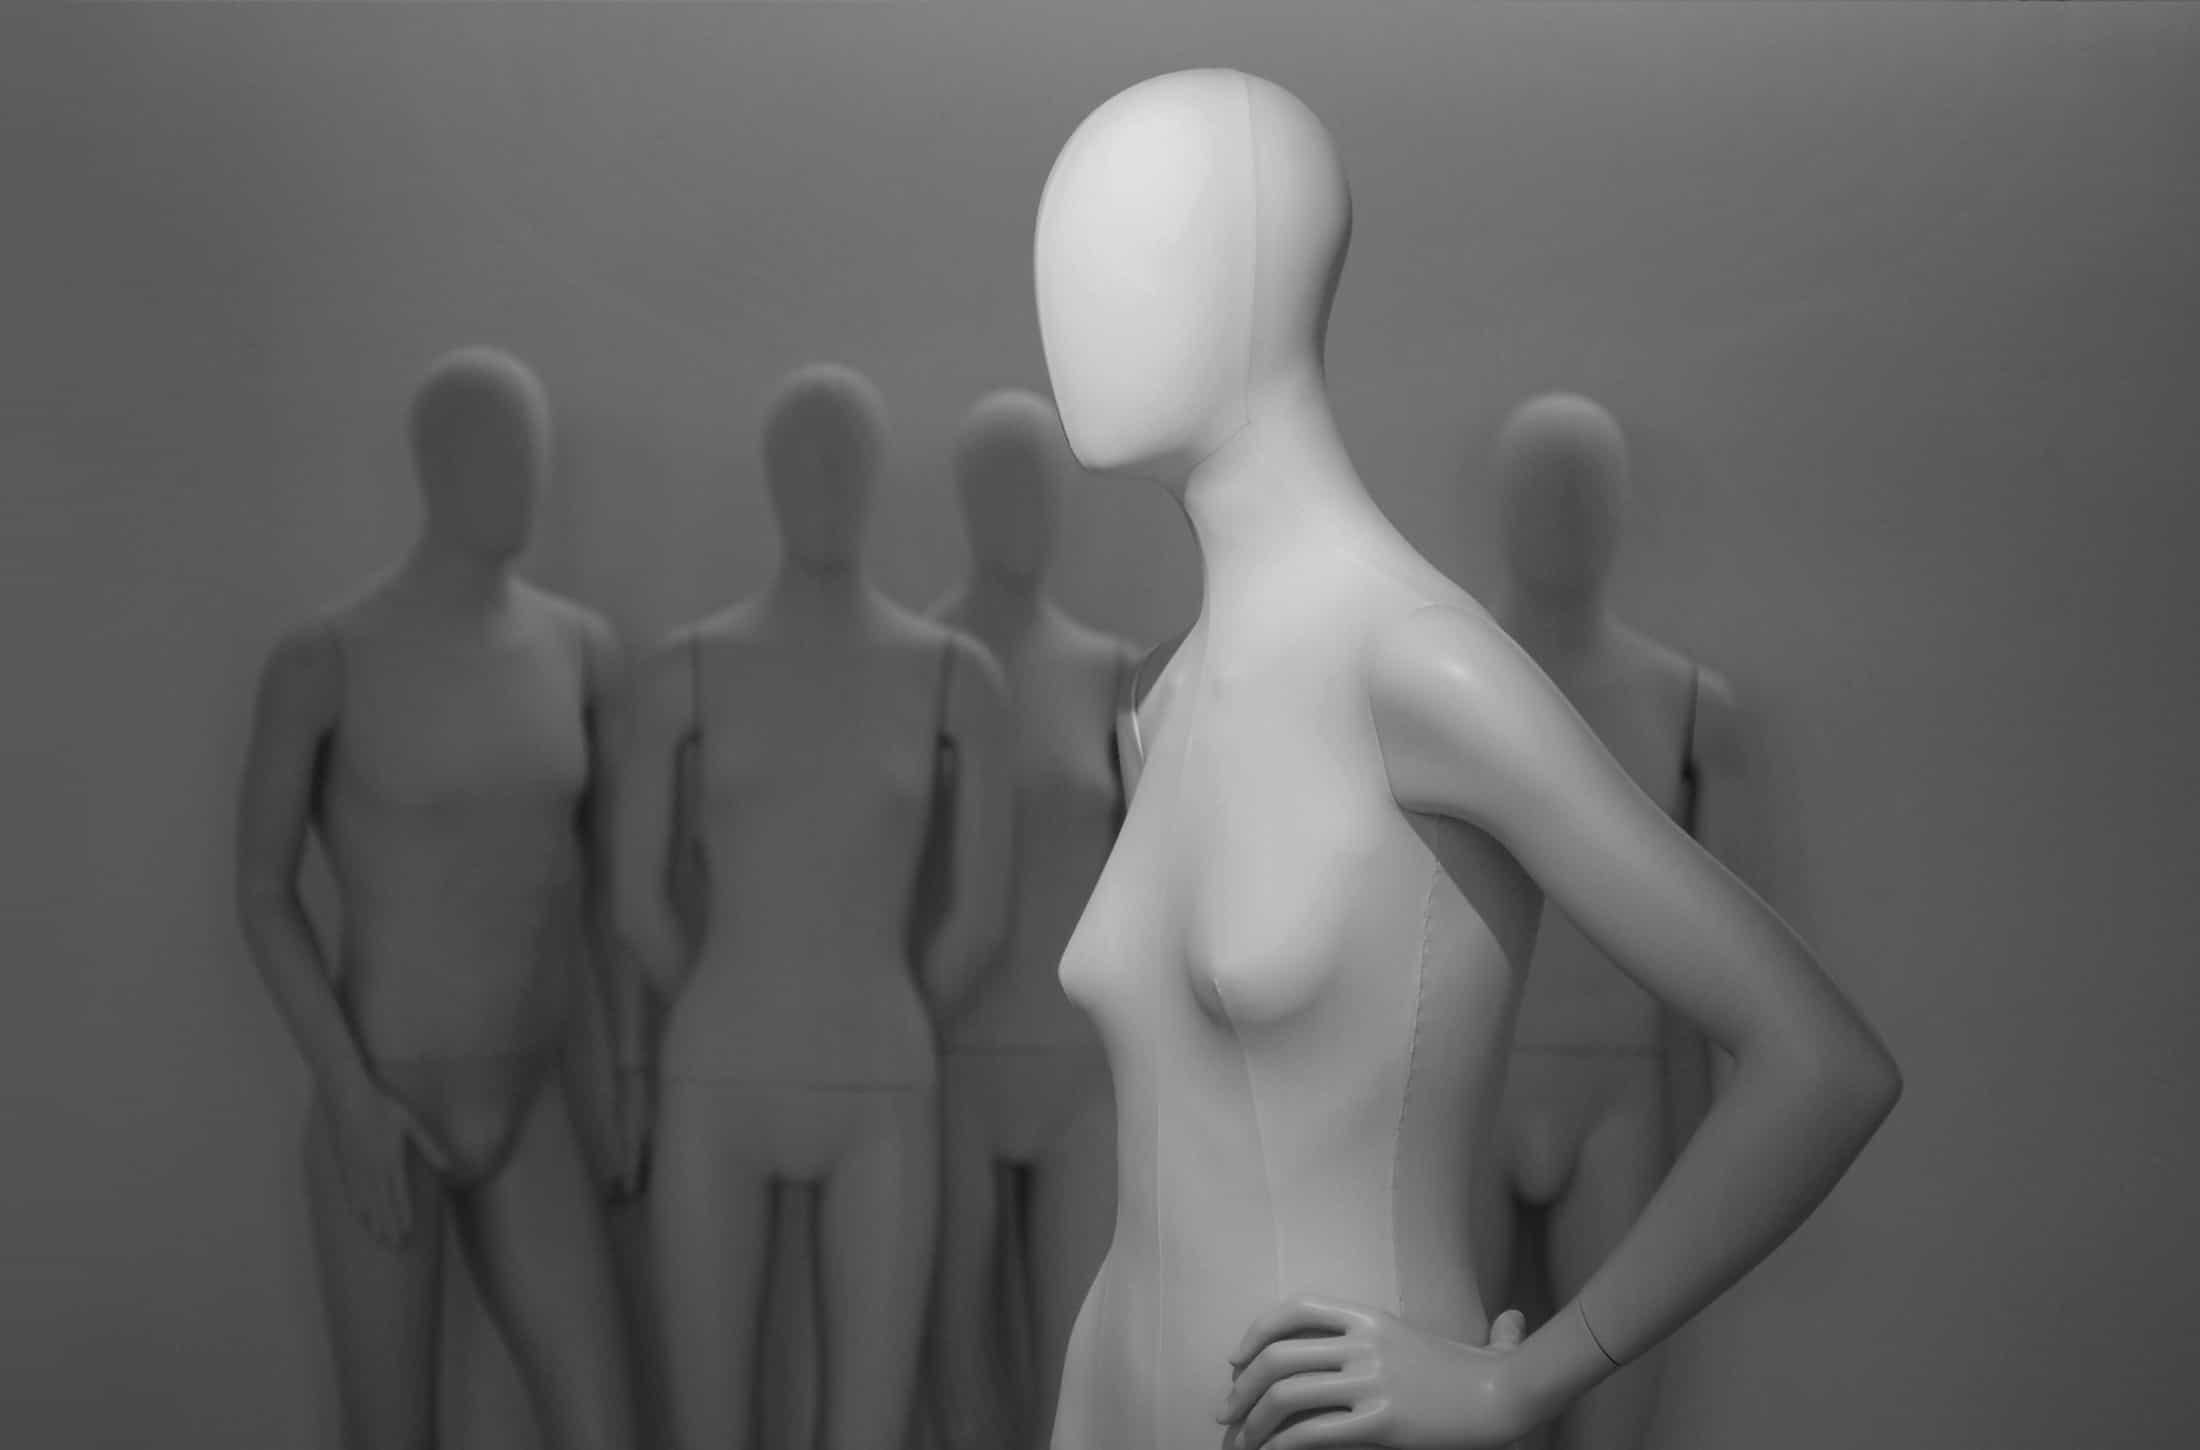 bonaveri fashion model mannequin collection 03